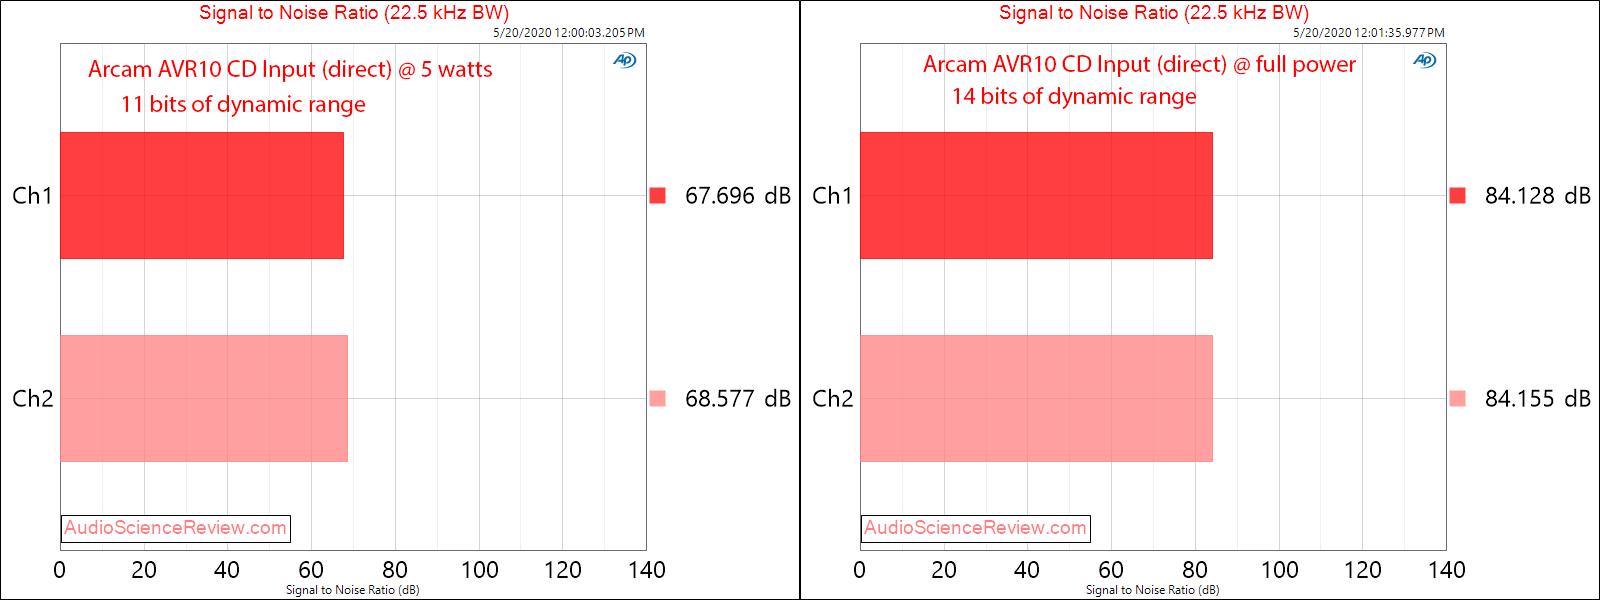 Arcam AVR10 AV Receiver Home Theater Doly Atmos UHD CD Input Dynamic Range Amplifier Audio Mea...png